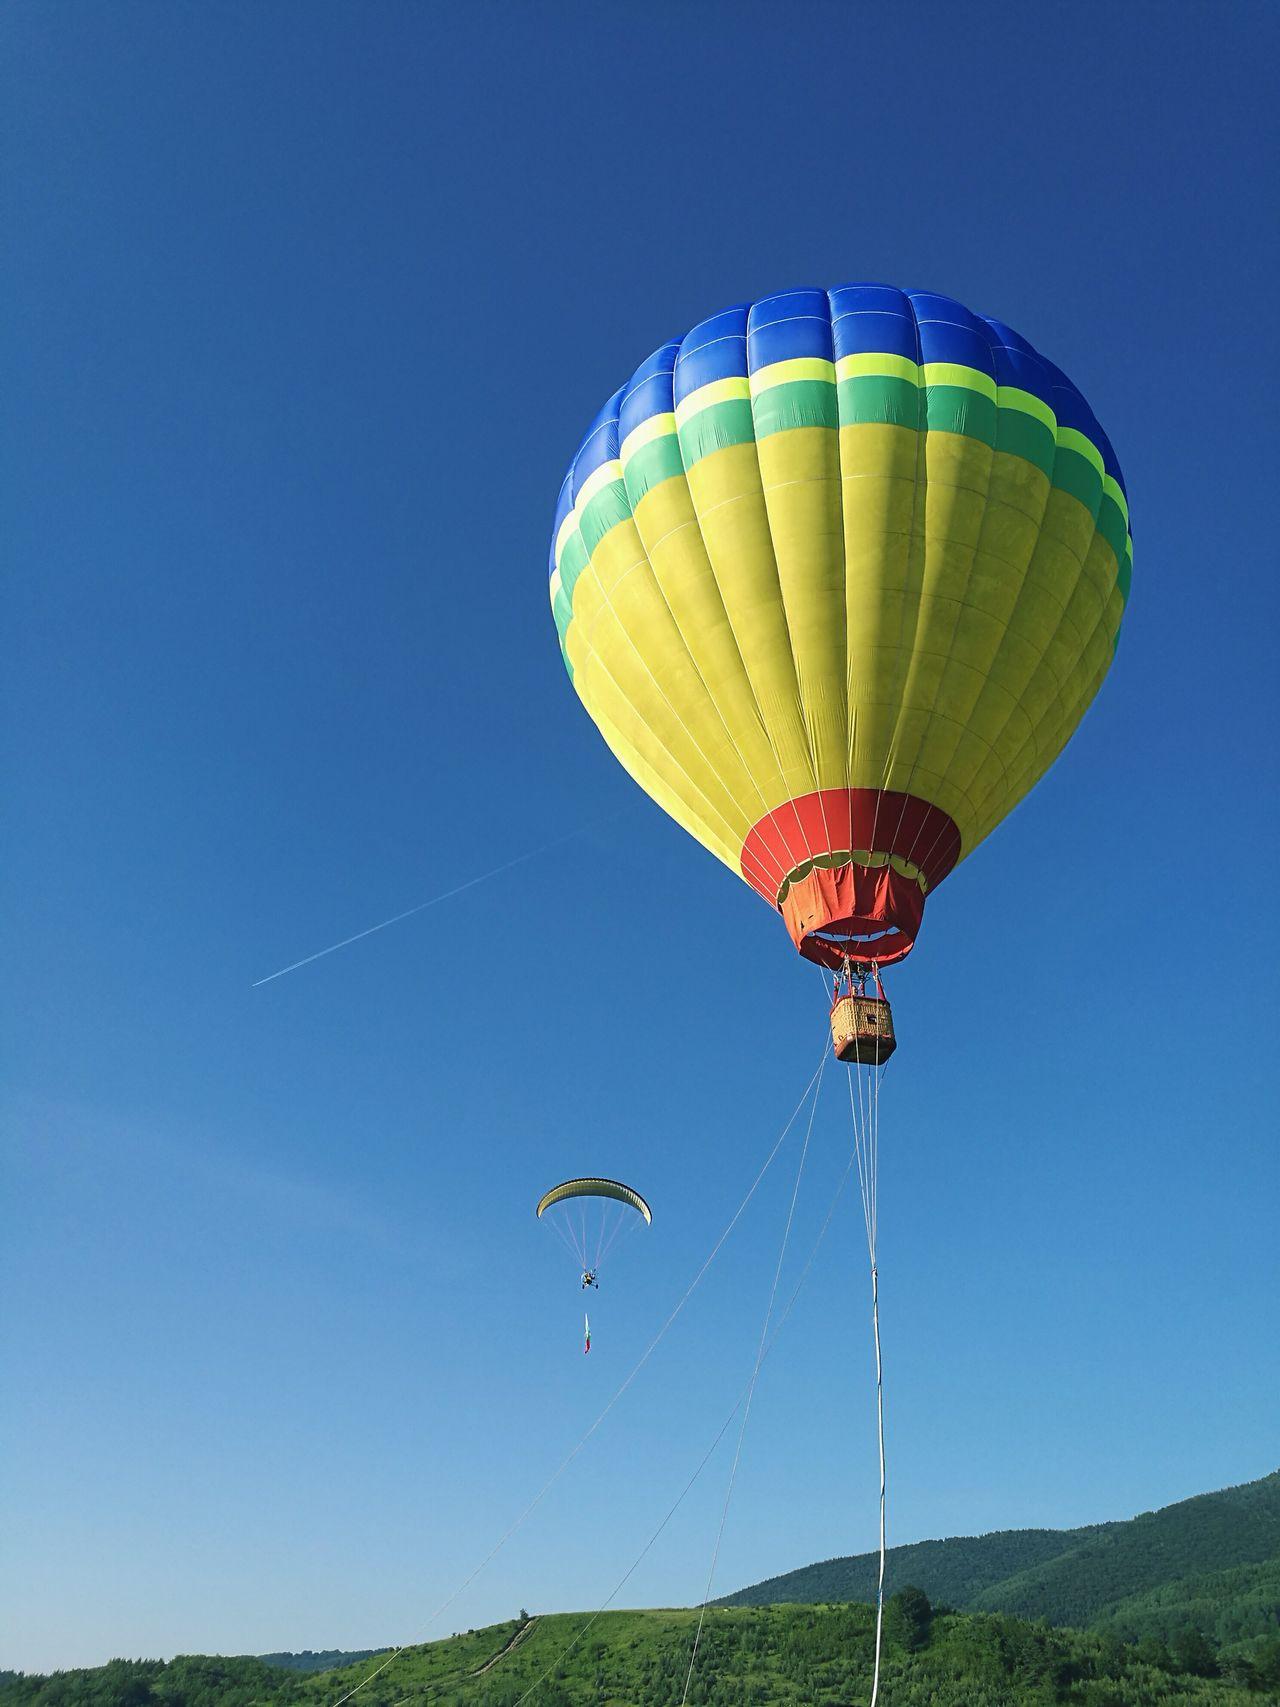 Airshows Airshow Airshowphotography Airballoons Baloonair AirBalloon Baloon Eyeemphotography EyeEm Eye4photography  EyeEm Best Shots Bulgaria EyeEm Gallery EyeEmBestPics Colour Of Life